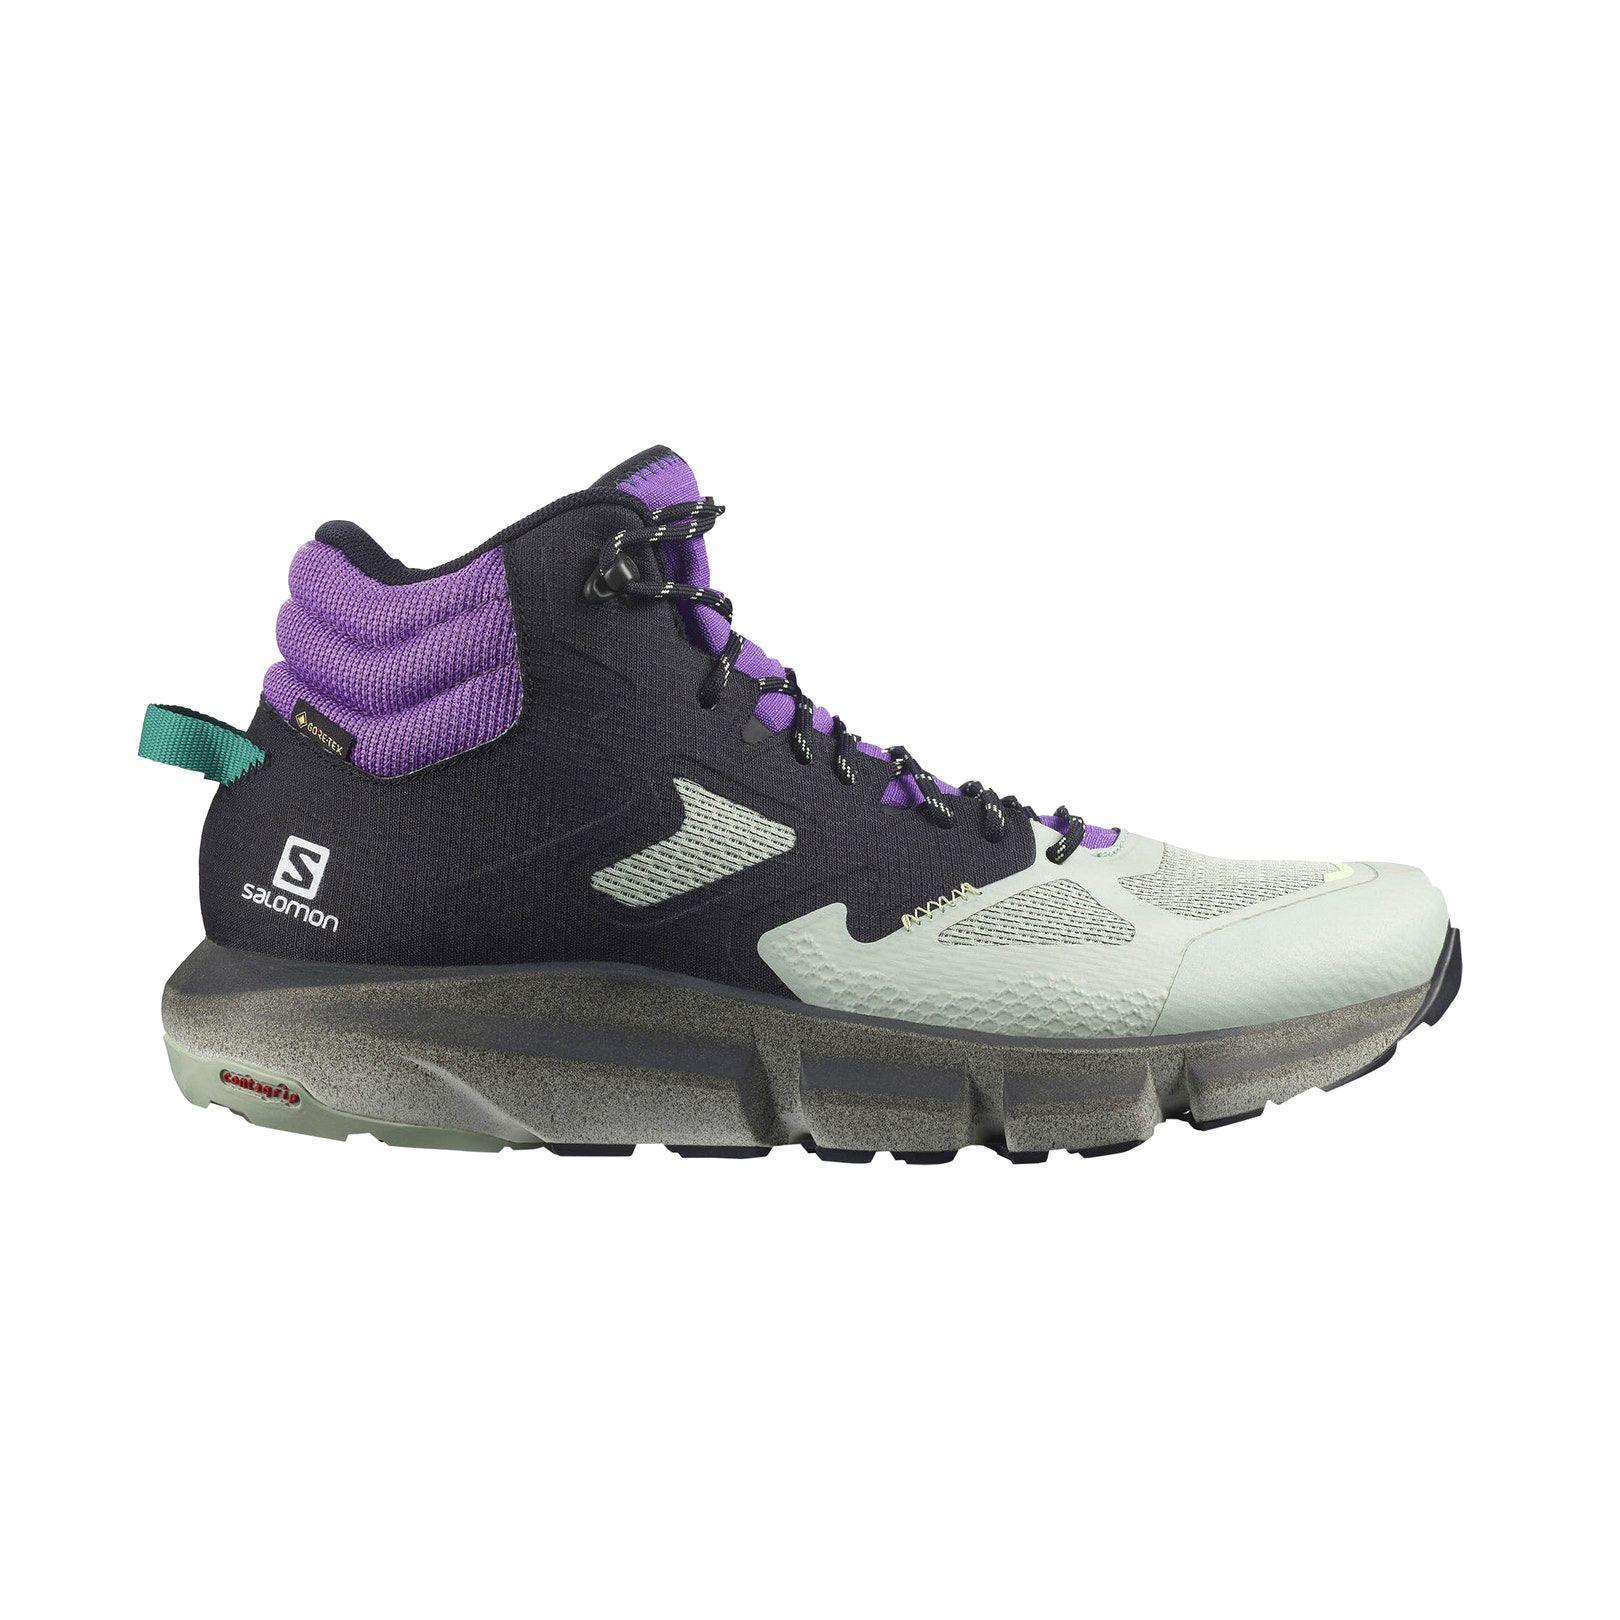 Salomon Men's Predict Hike Mid Gore-Tex in Black/Aqua Grey/Royal Lilac